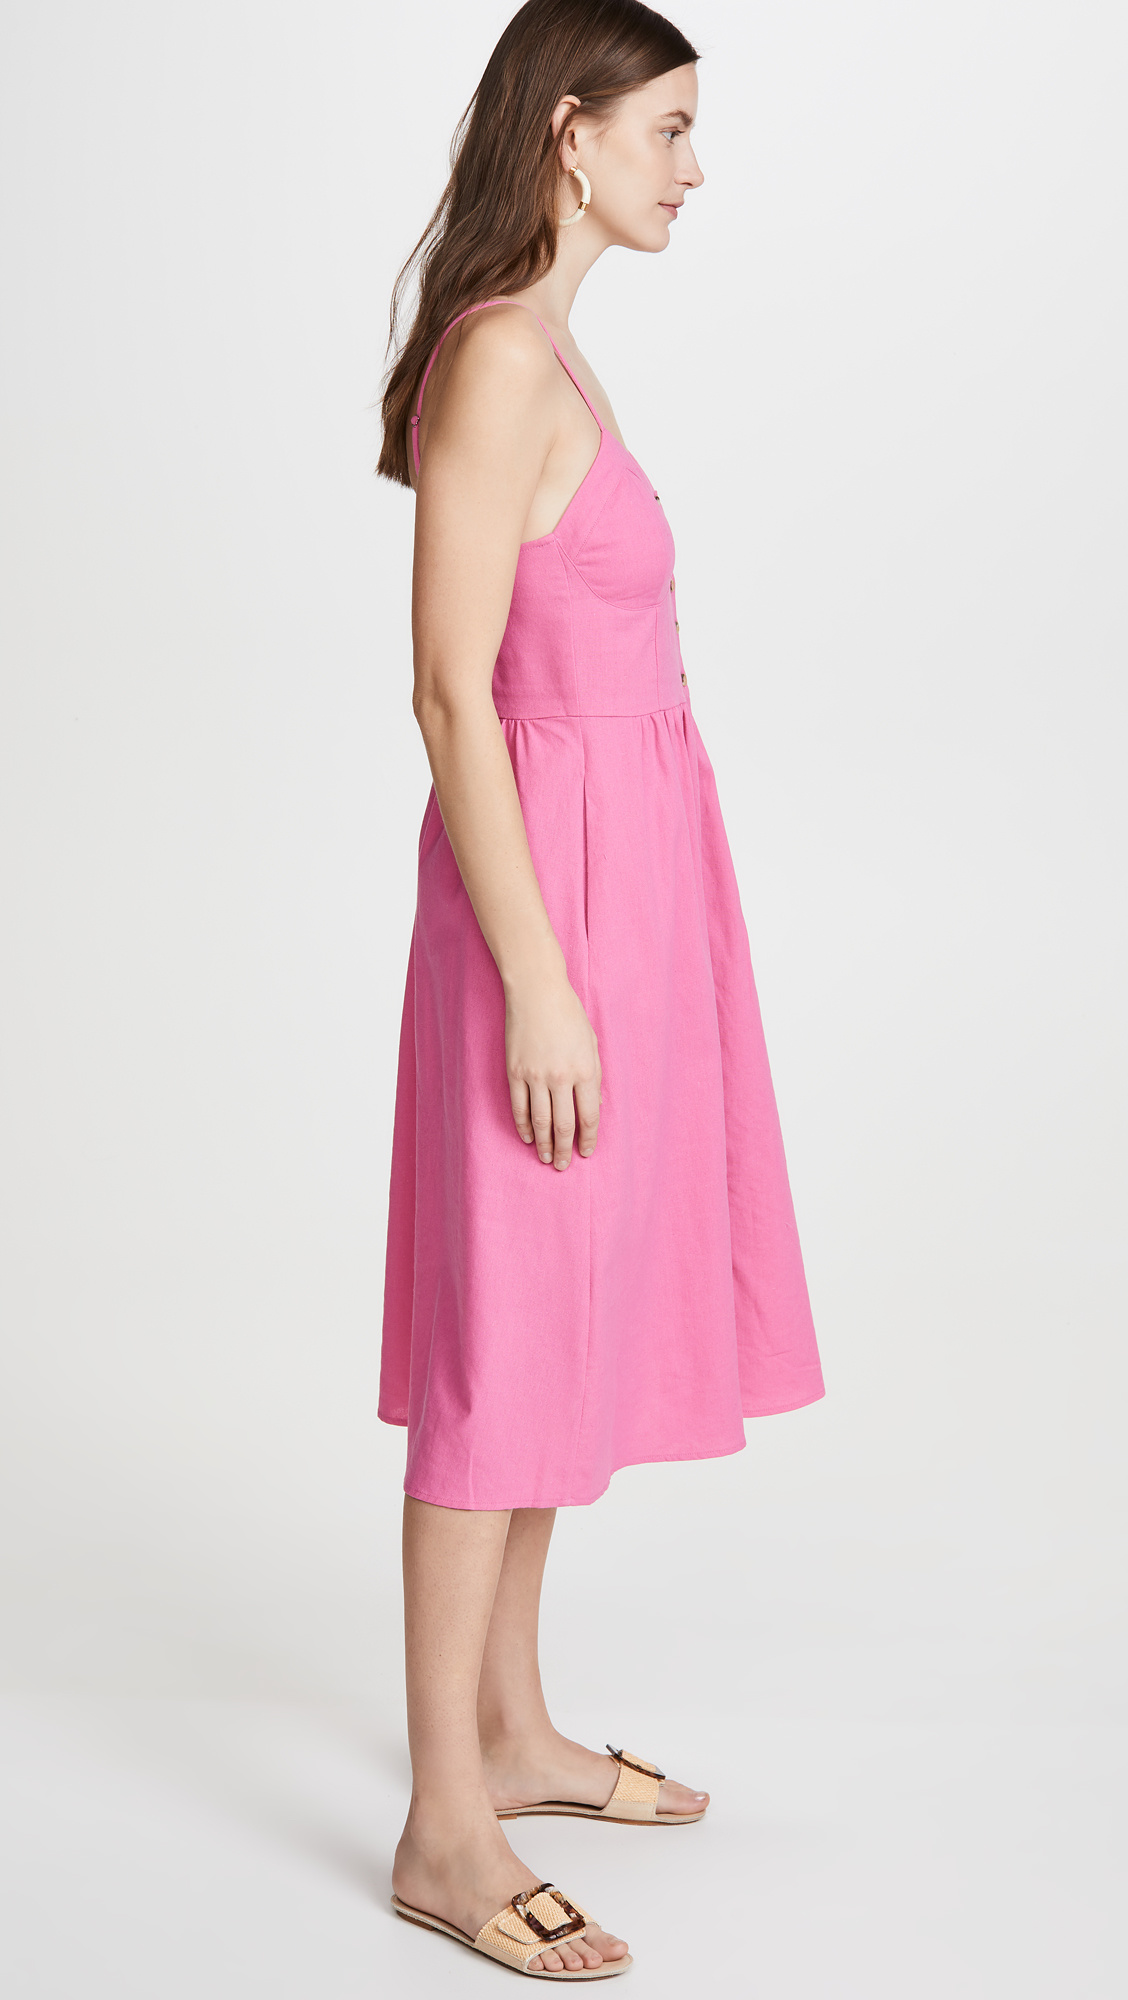 Rollas Eve Dress, Hot Pink